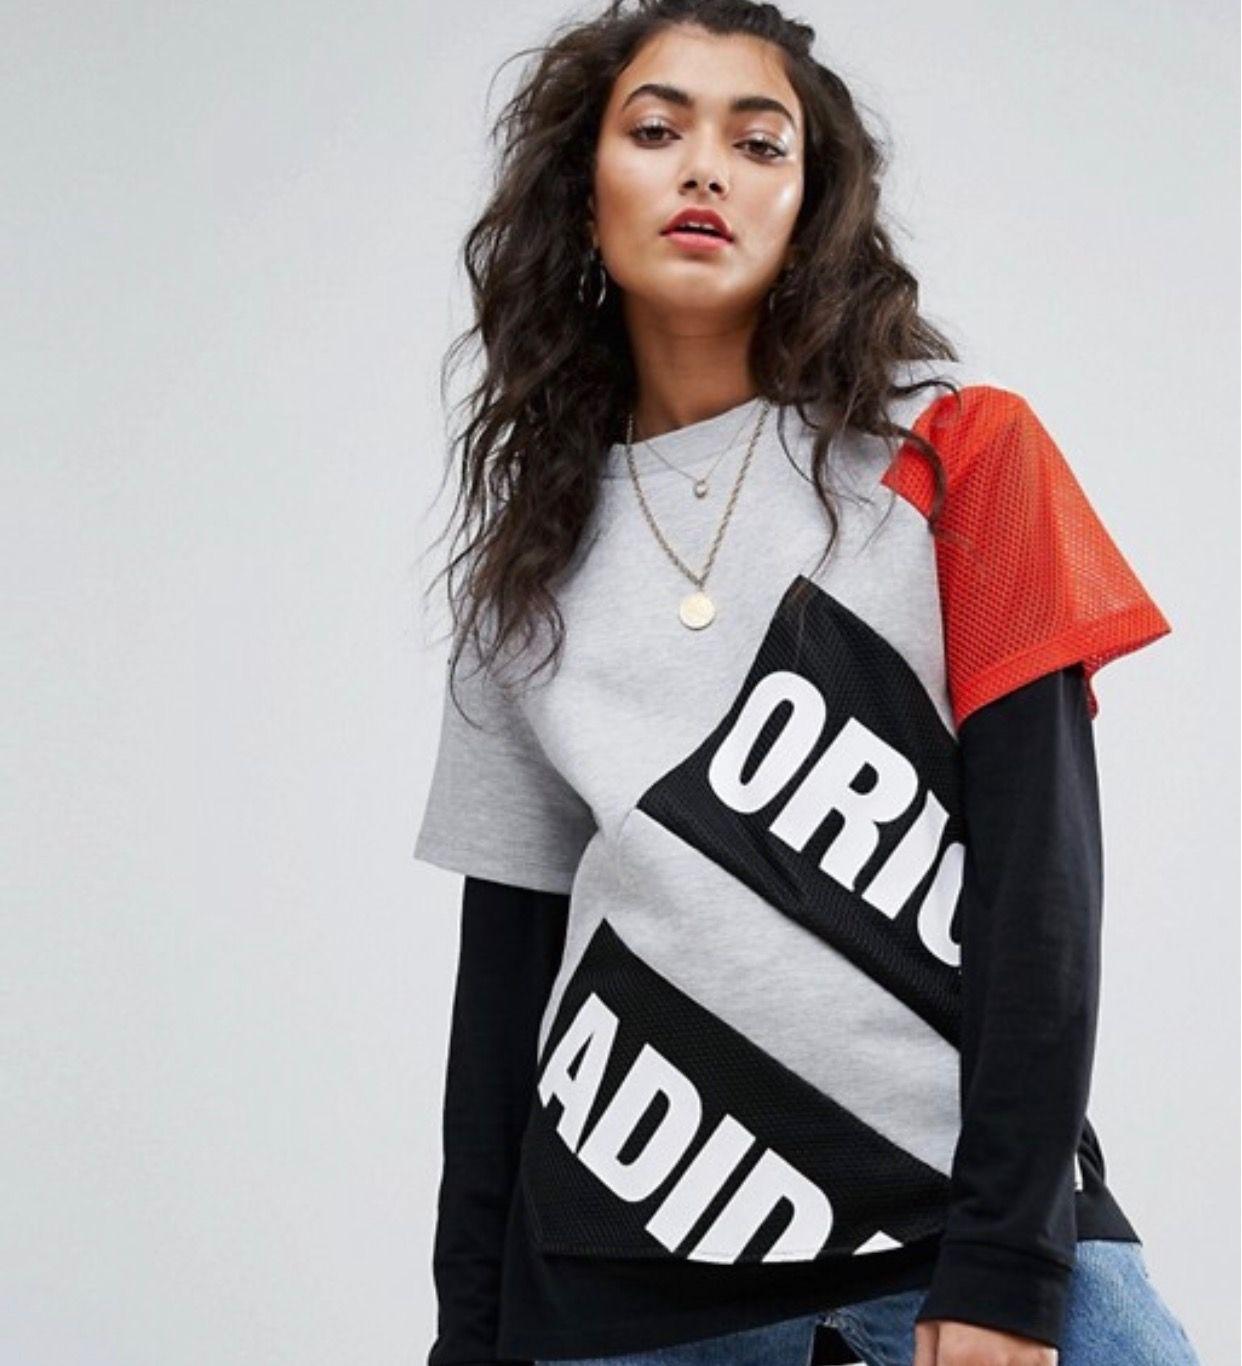 88084be84f Camisas De Gimnasia · Camisetas Para Mujeres · Ropa Para Mujeres · Zapatos  · ASOS Adidas Original Top